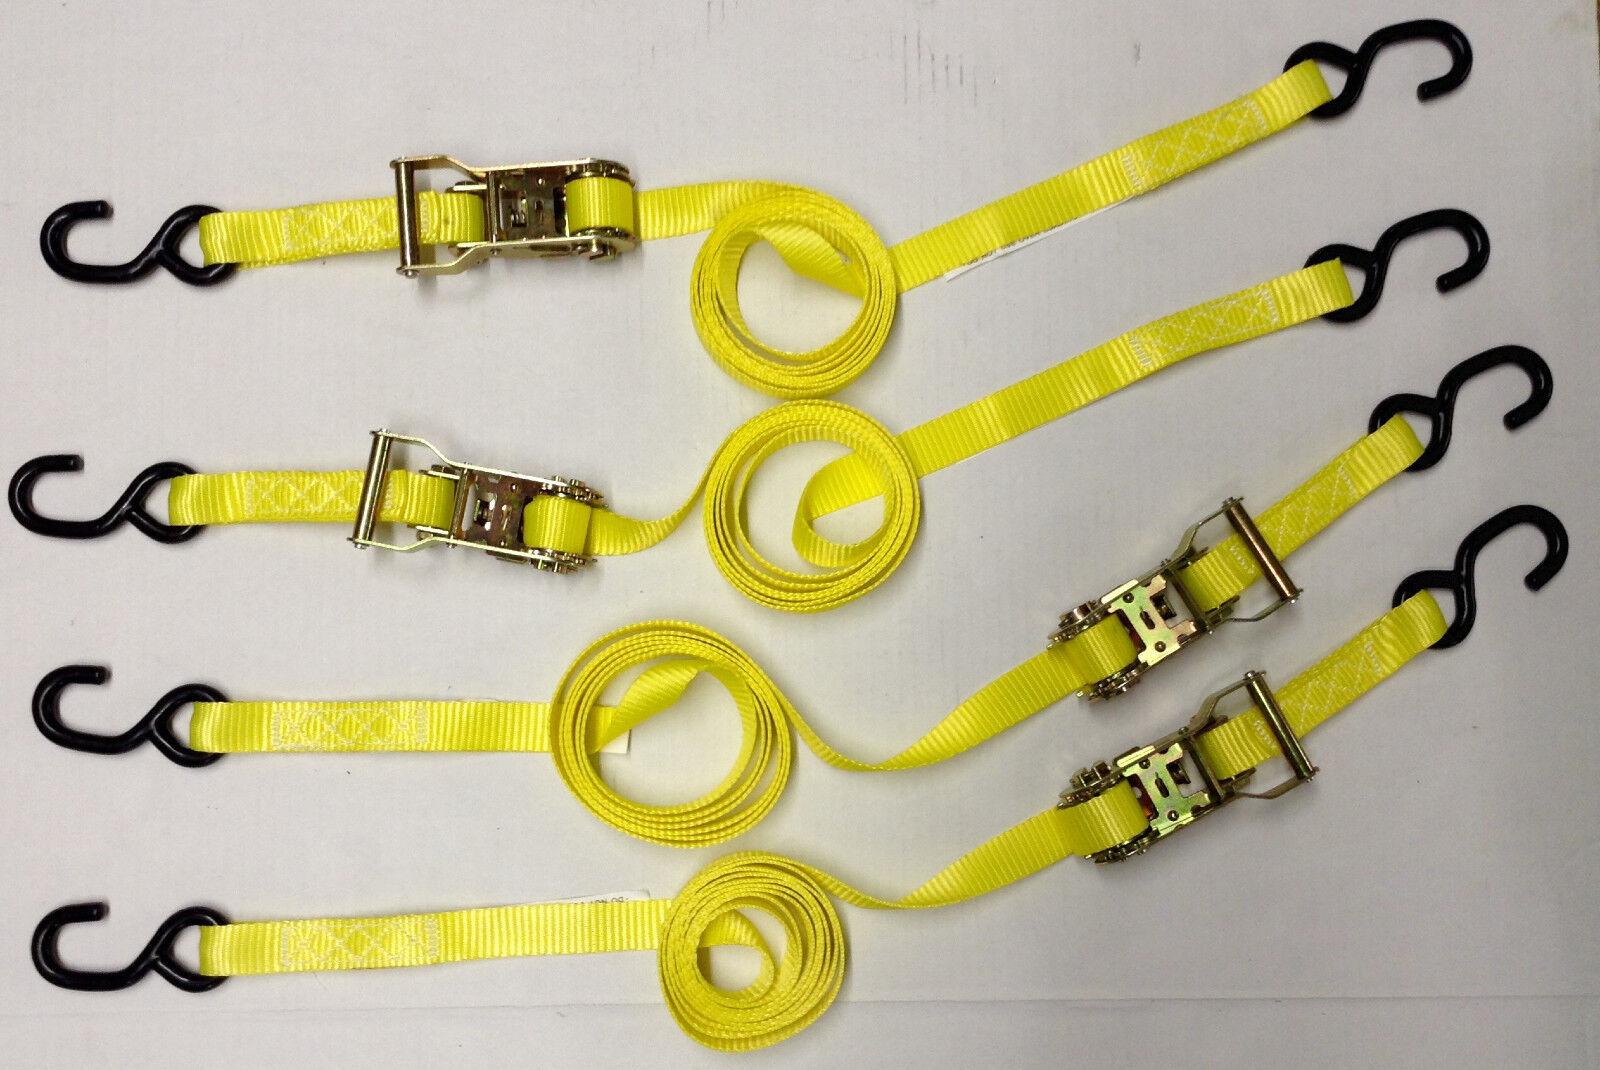 1 x10' Heavy Duty Ratcheting Tie Down Set - 4pcs - color Yellow